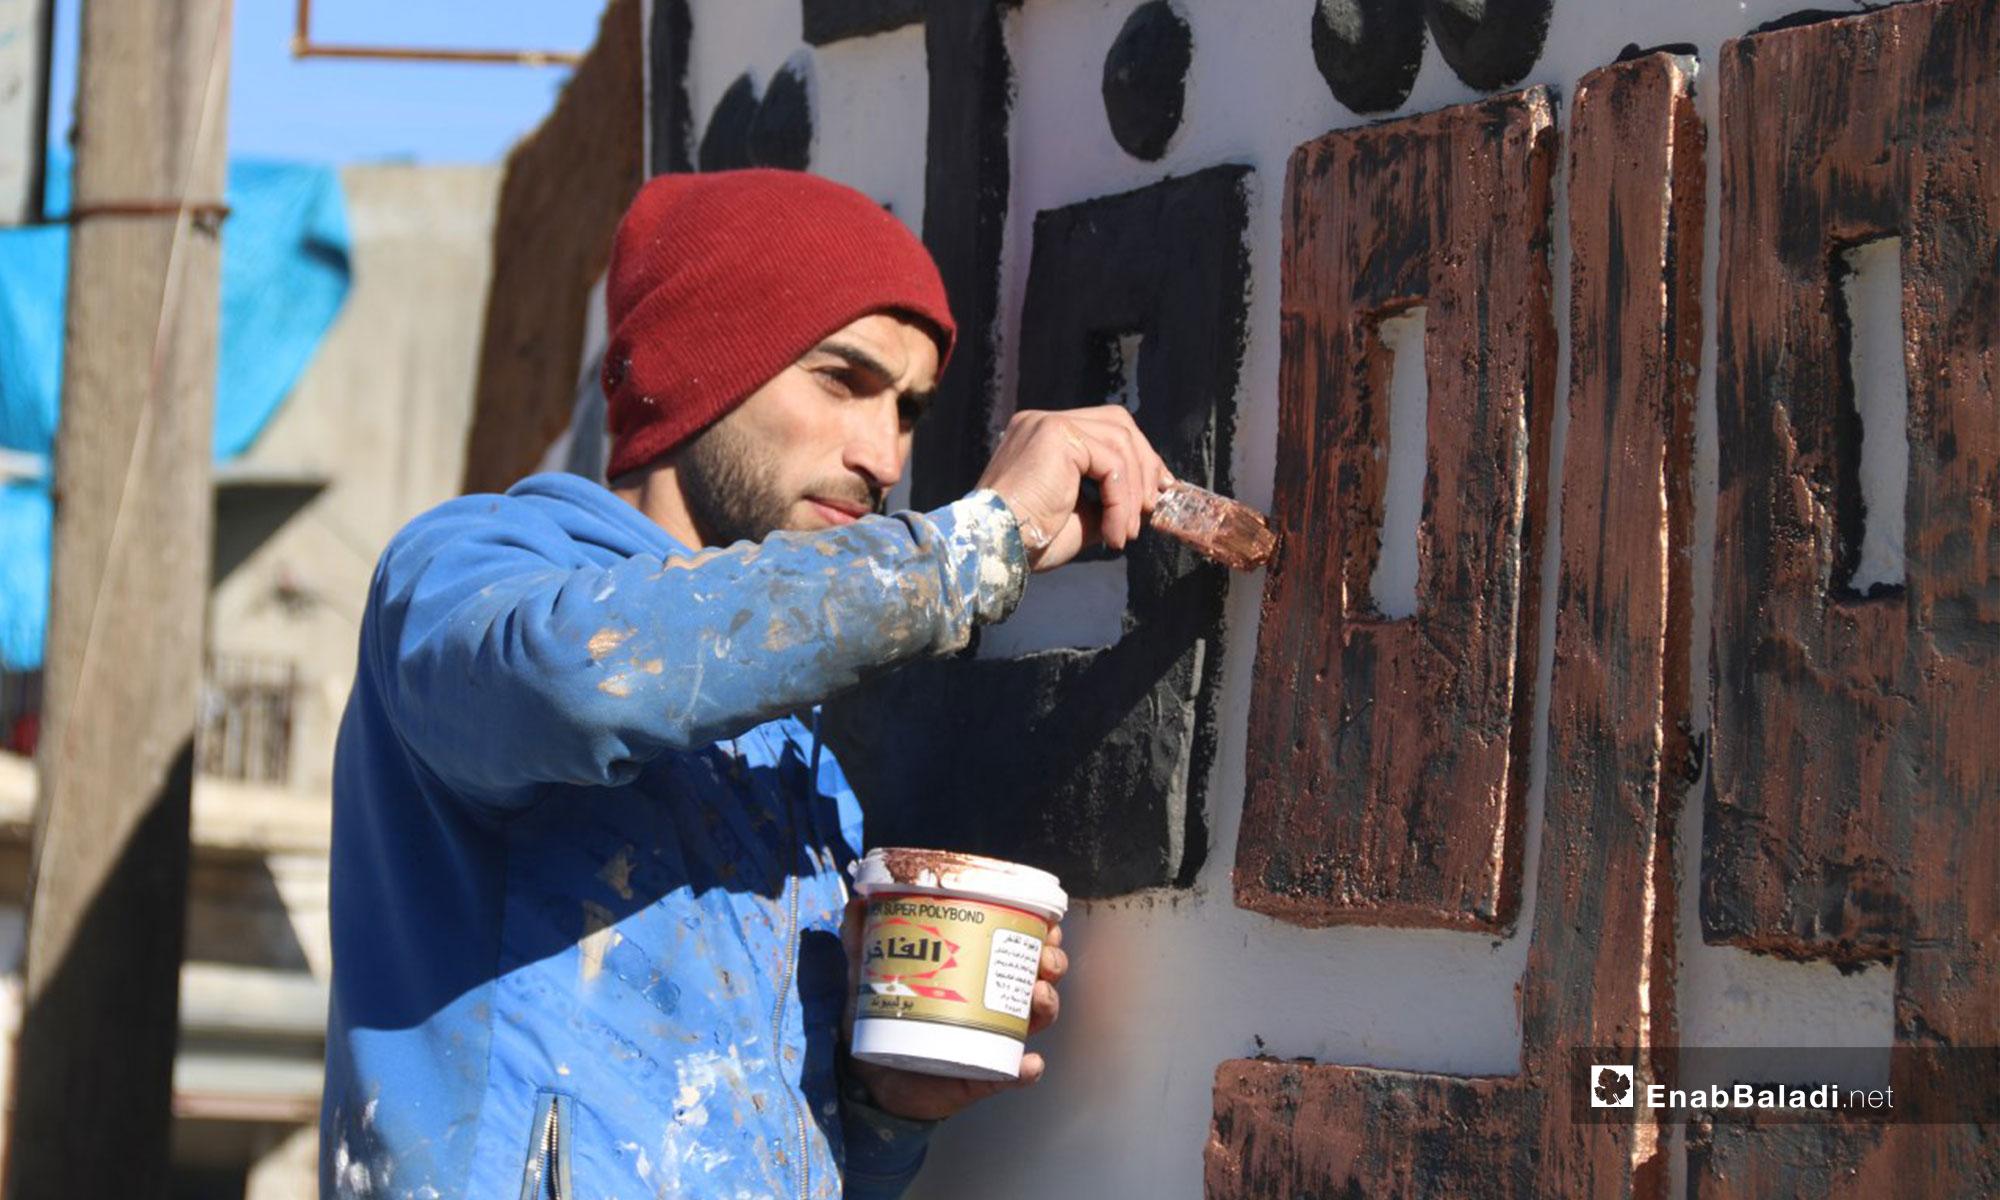 A mural in Kafr Nabl, Idlib, in memory of Raed Fares – February 5, 2019 (Enab Baladi)